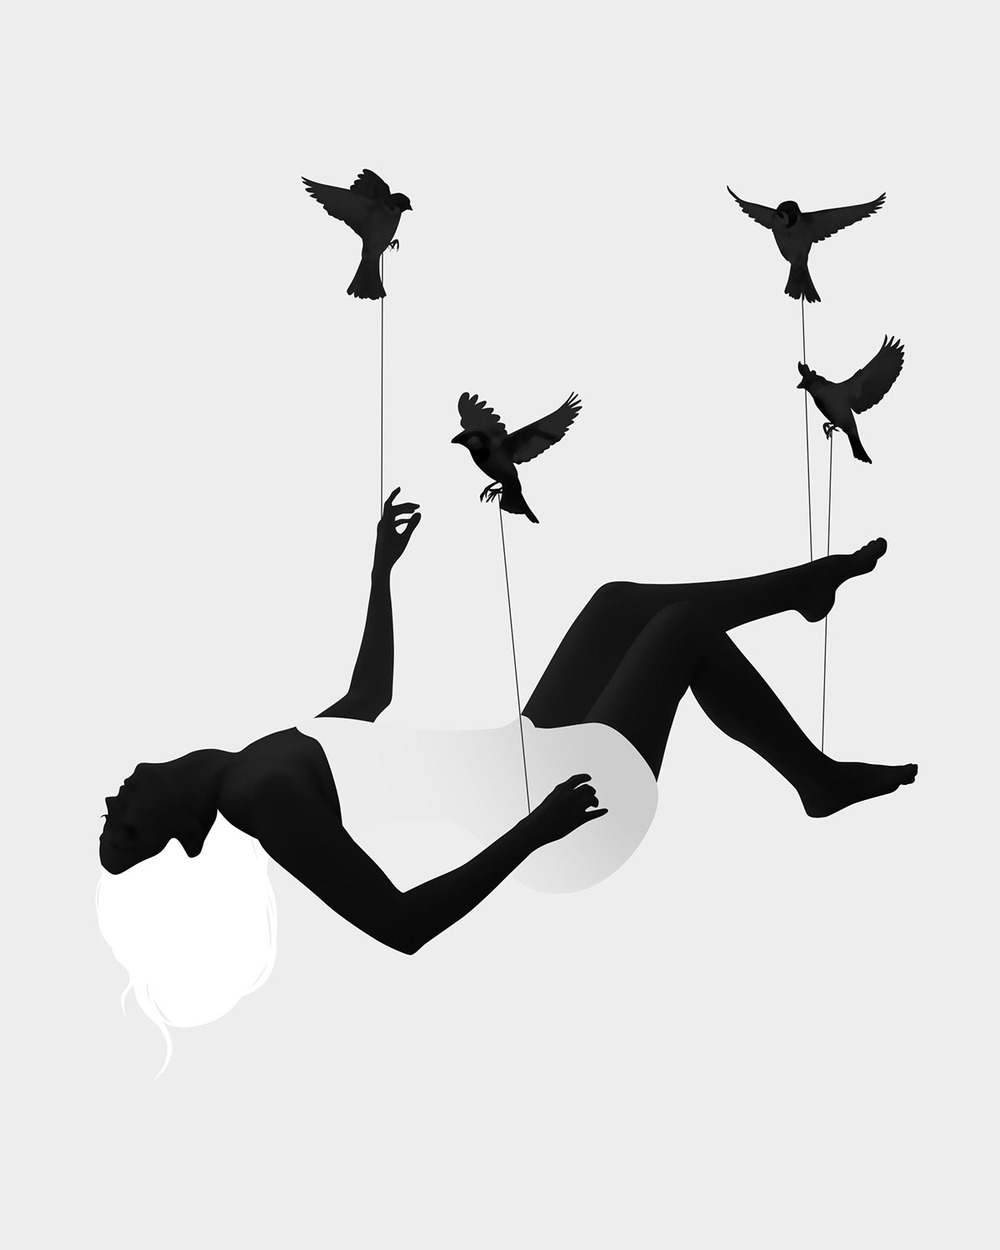 minimalistic-silhouette-illustrations-tomasz-wagner-thatsitmag4.jpeg